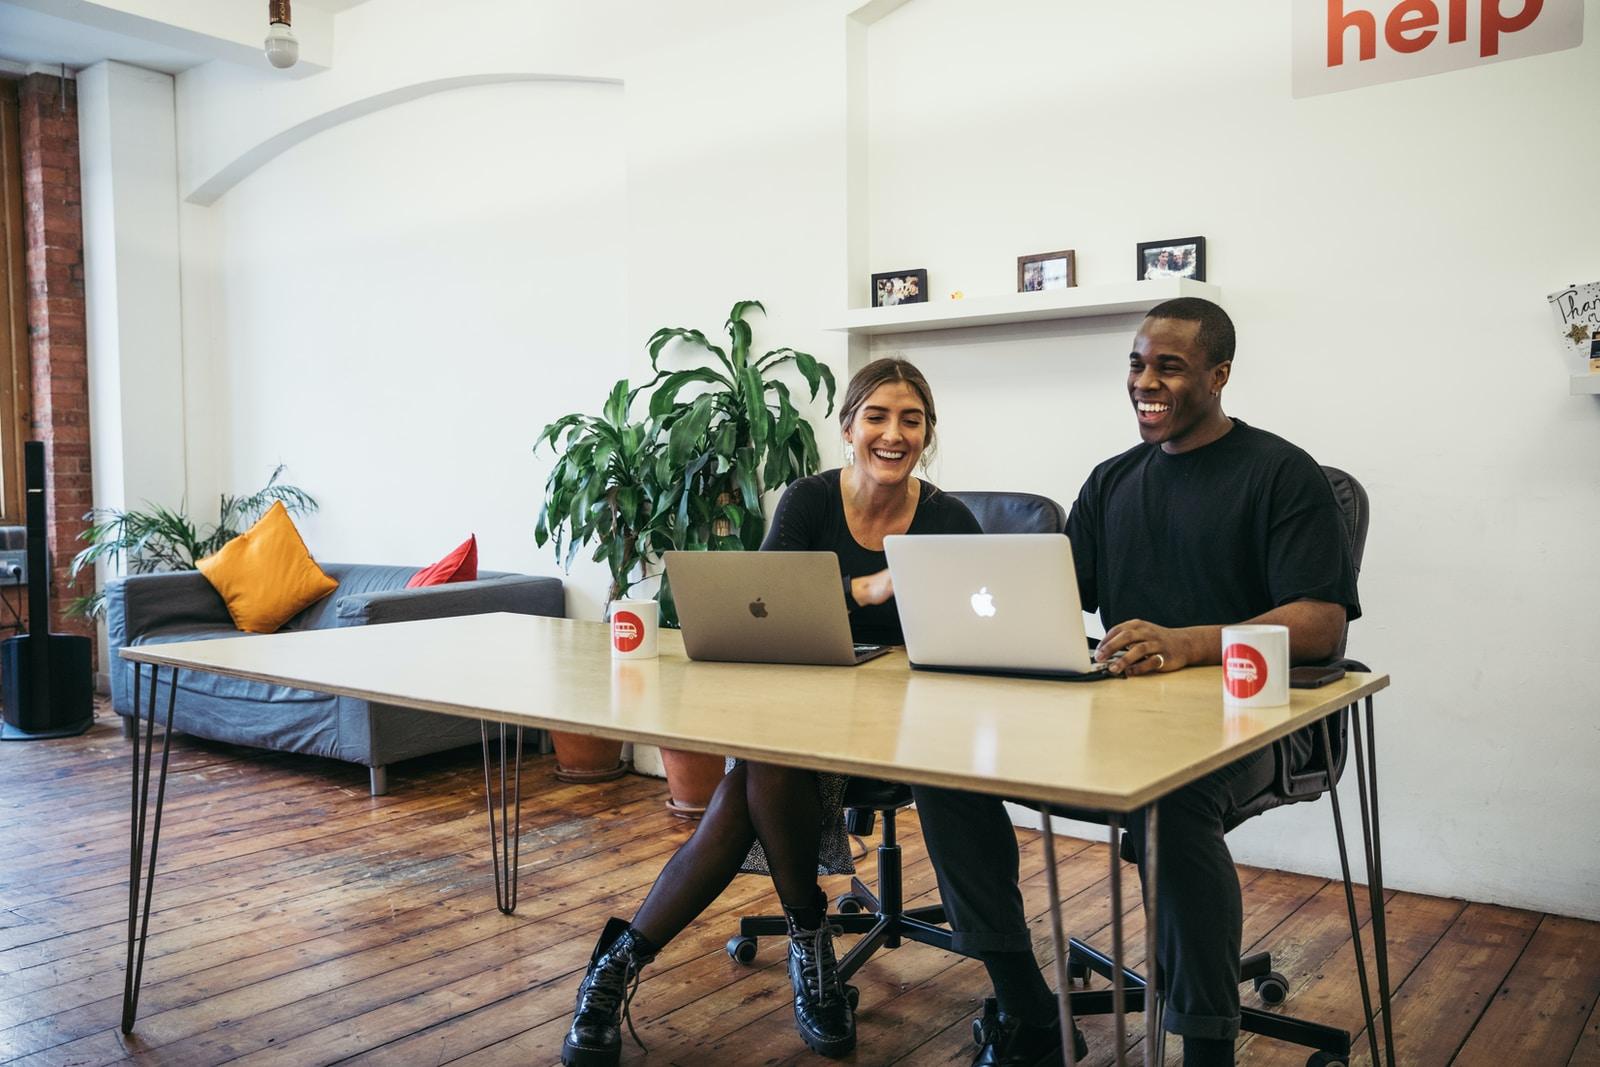 man in black long sleeve shirt sitting beside woman in black long sleeve shirt using macbook